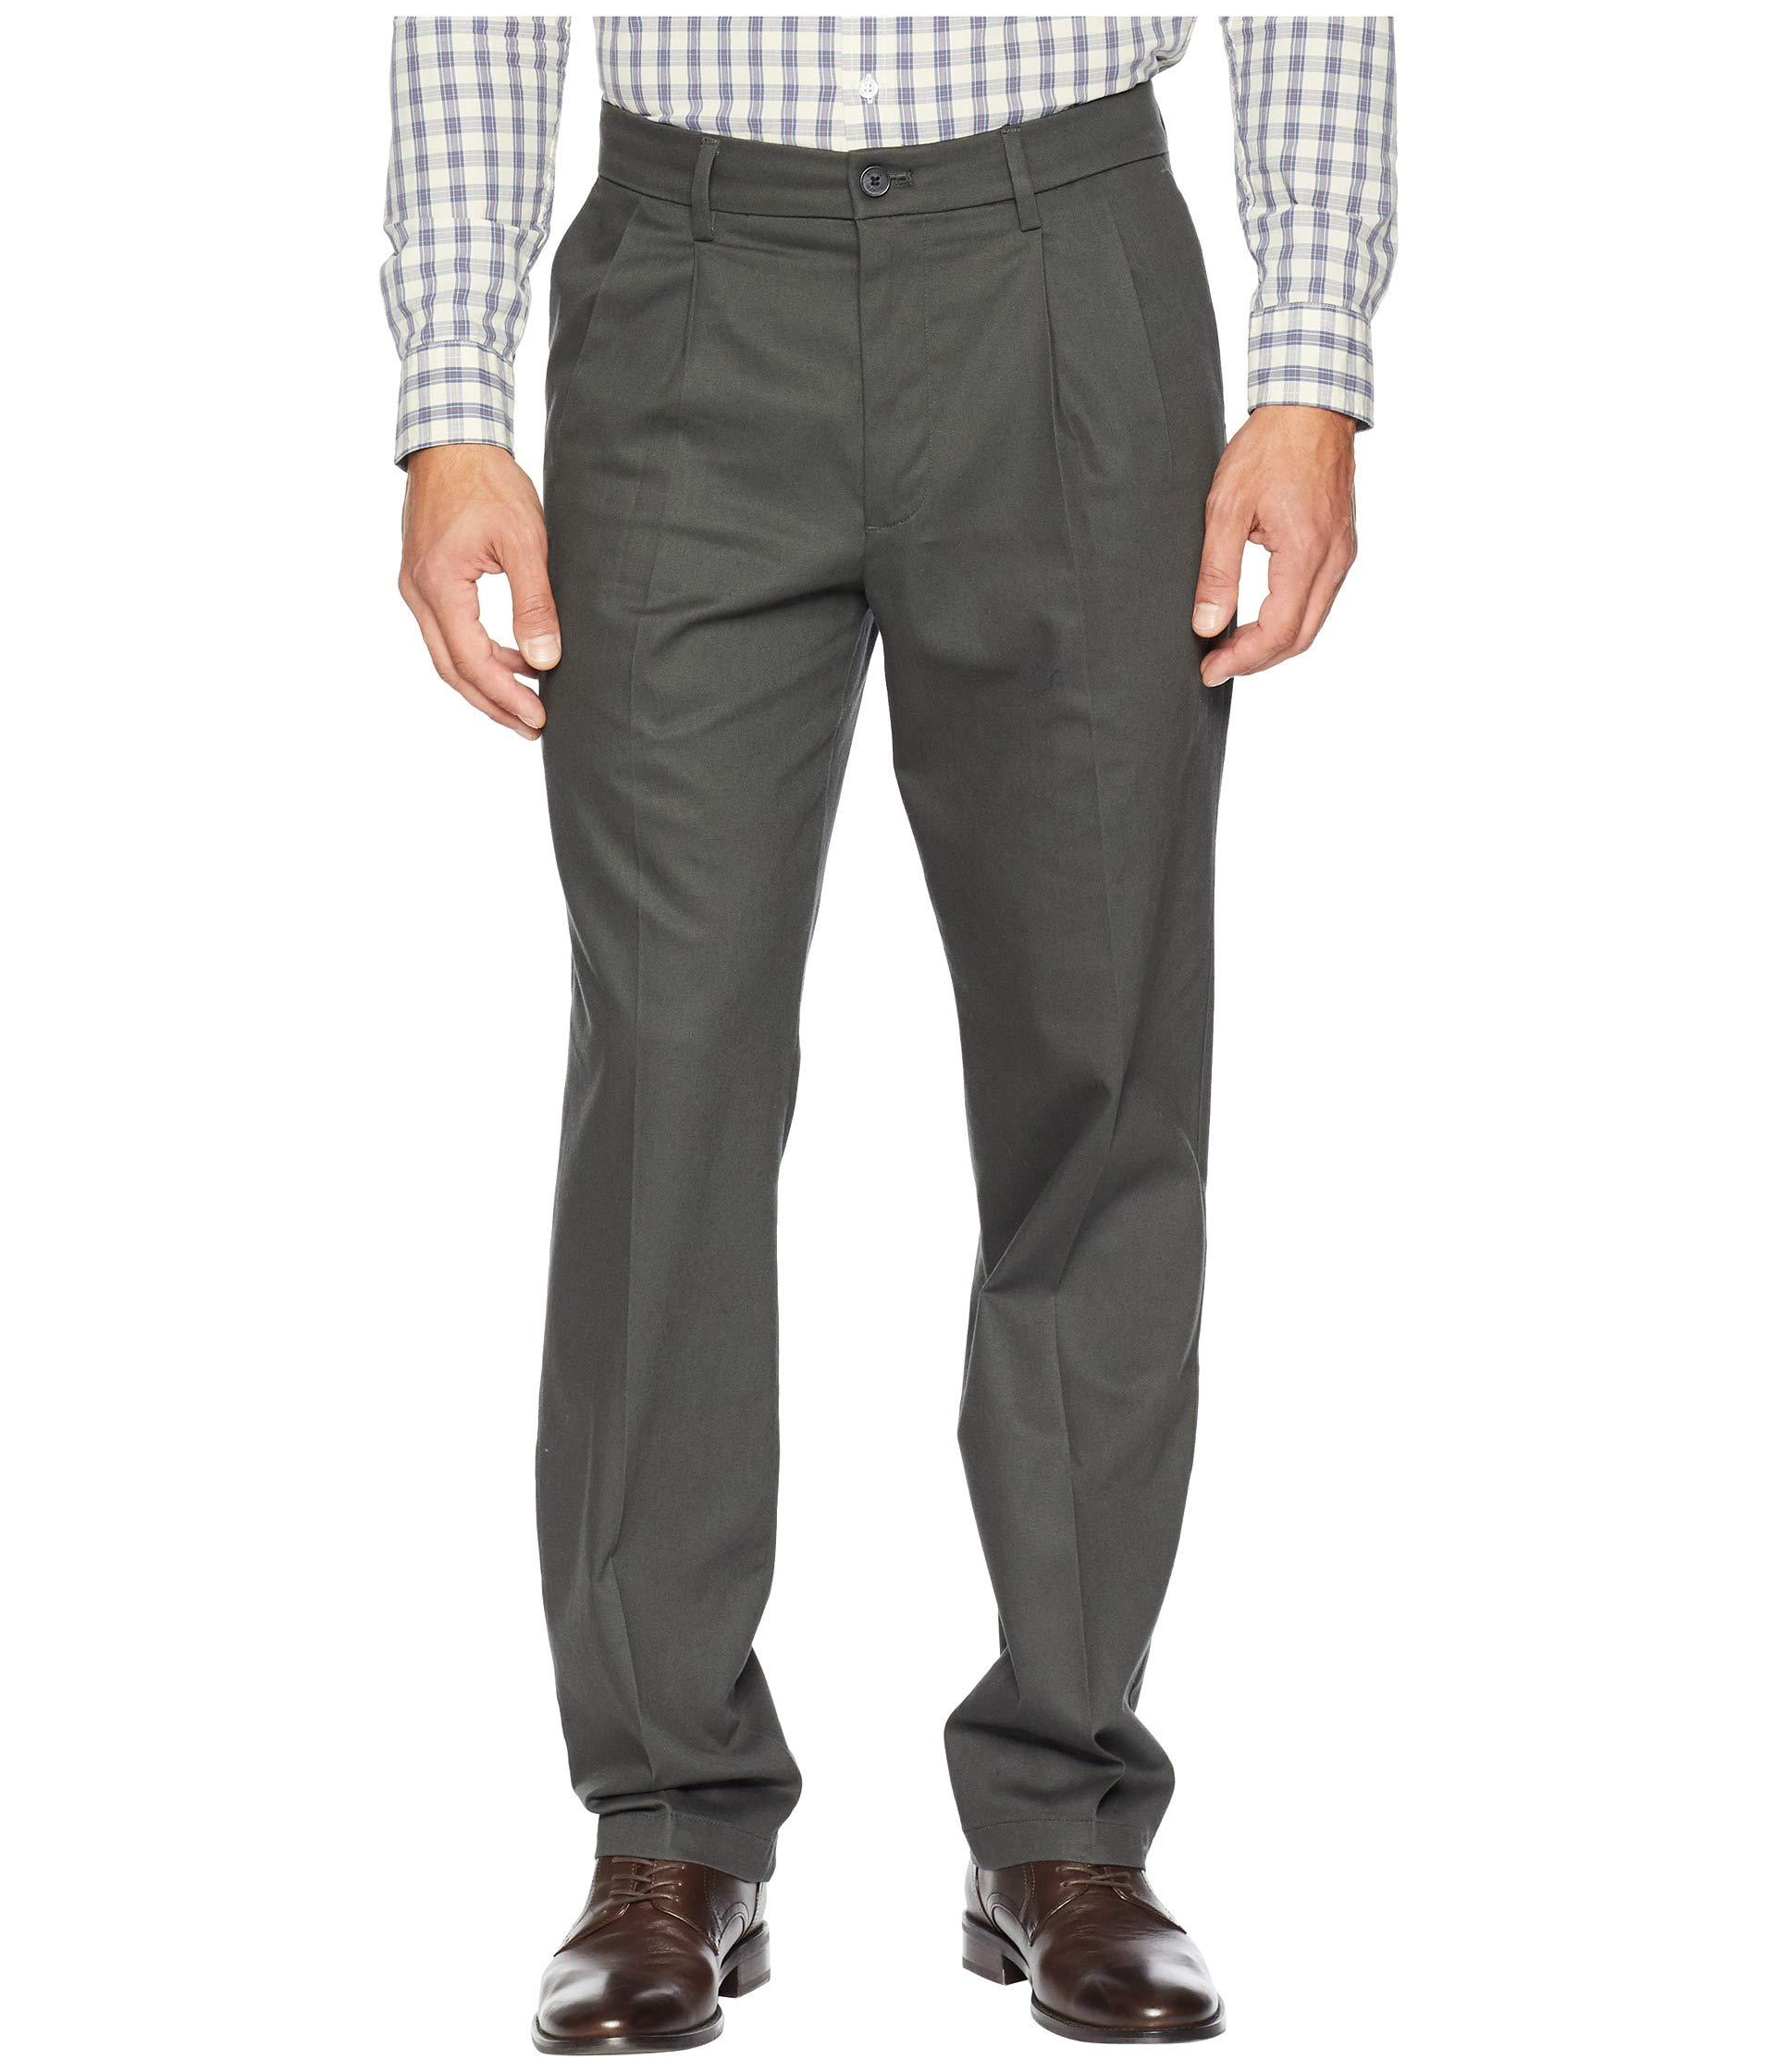 Pants Fit Stretch D3 Signature Cotton Steelhead Classic Dockers Pleated Lux Khaki P15qnWZS0a